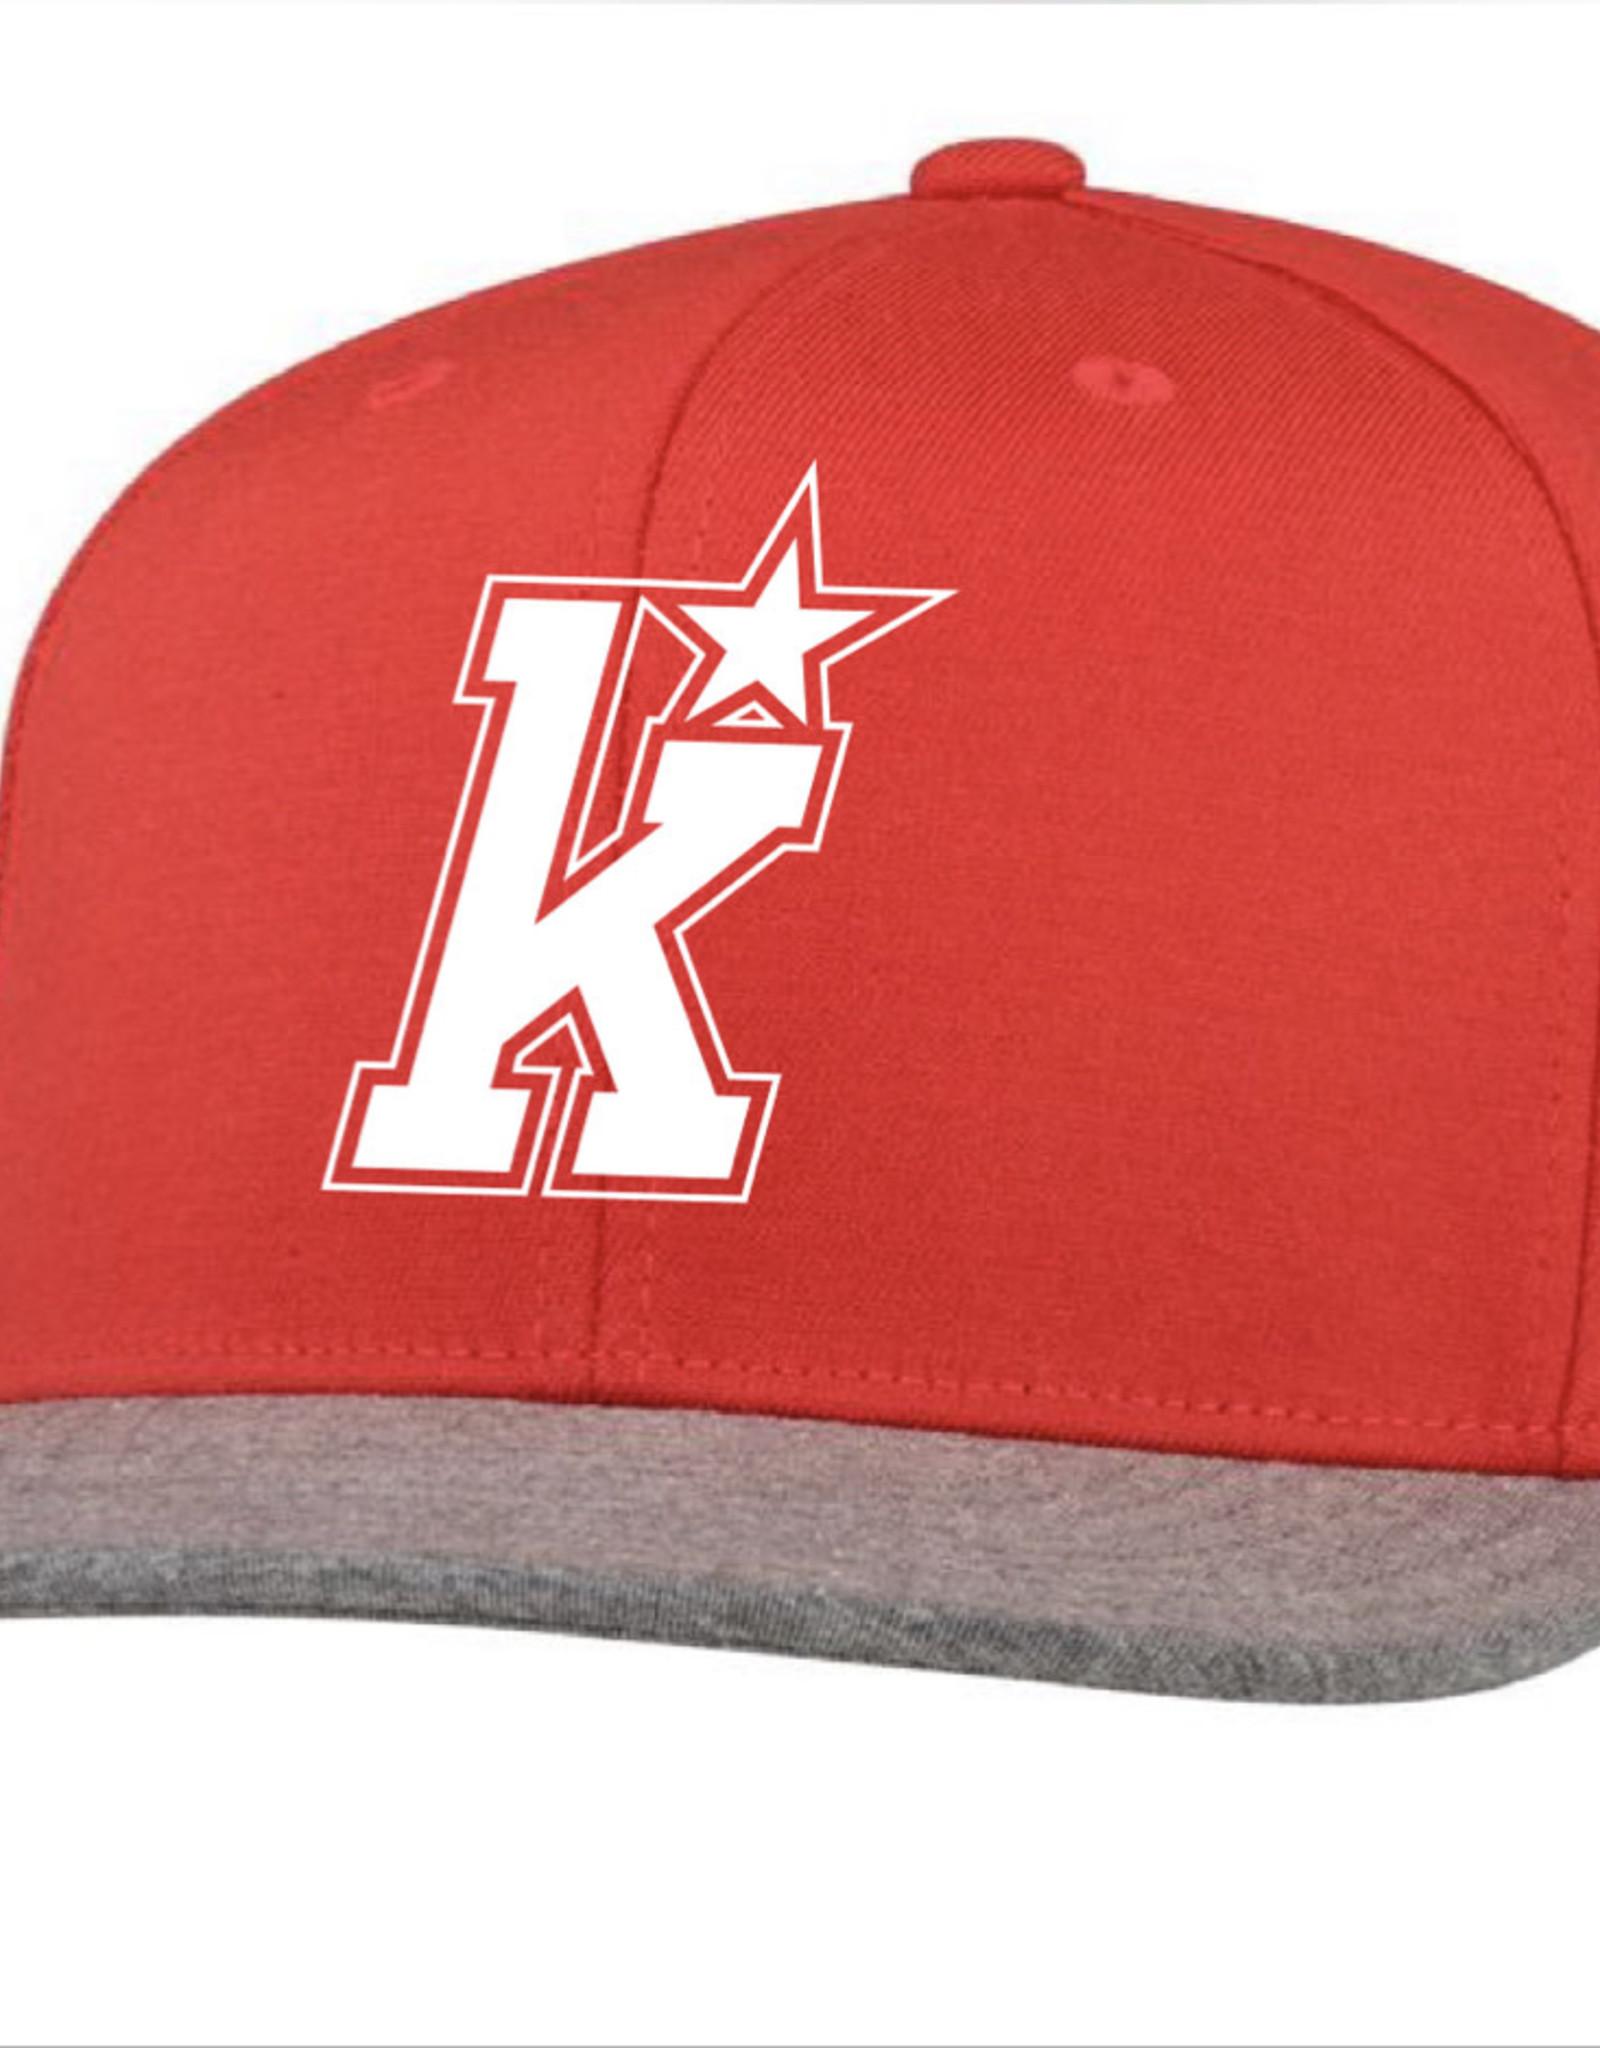 CCM Kirkwood CCM Snapback Hat (RED) YOUTH